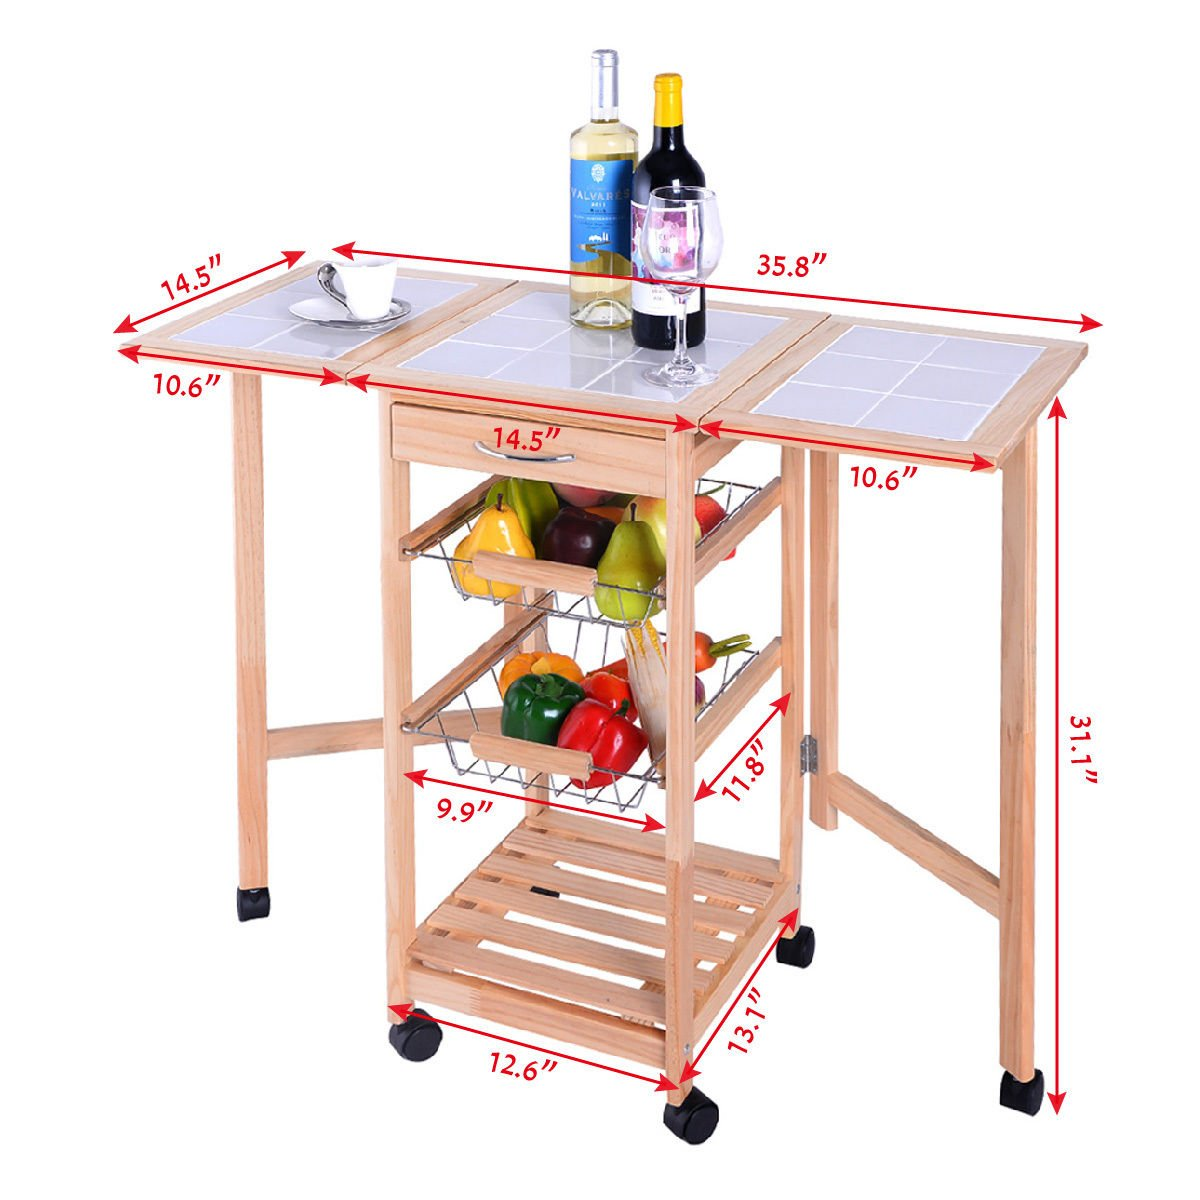 PROSPERLY U.S.Product Portable Rolling Wood Kitchen Trolley Cart Drop Leaf Storage Drawers Rack Basket by Prosperly (Image #5)